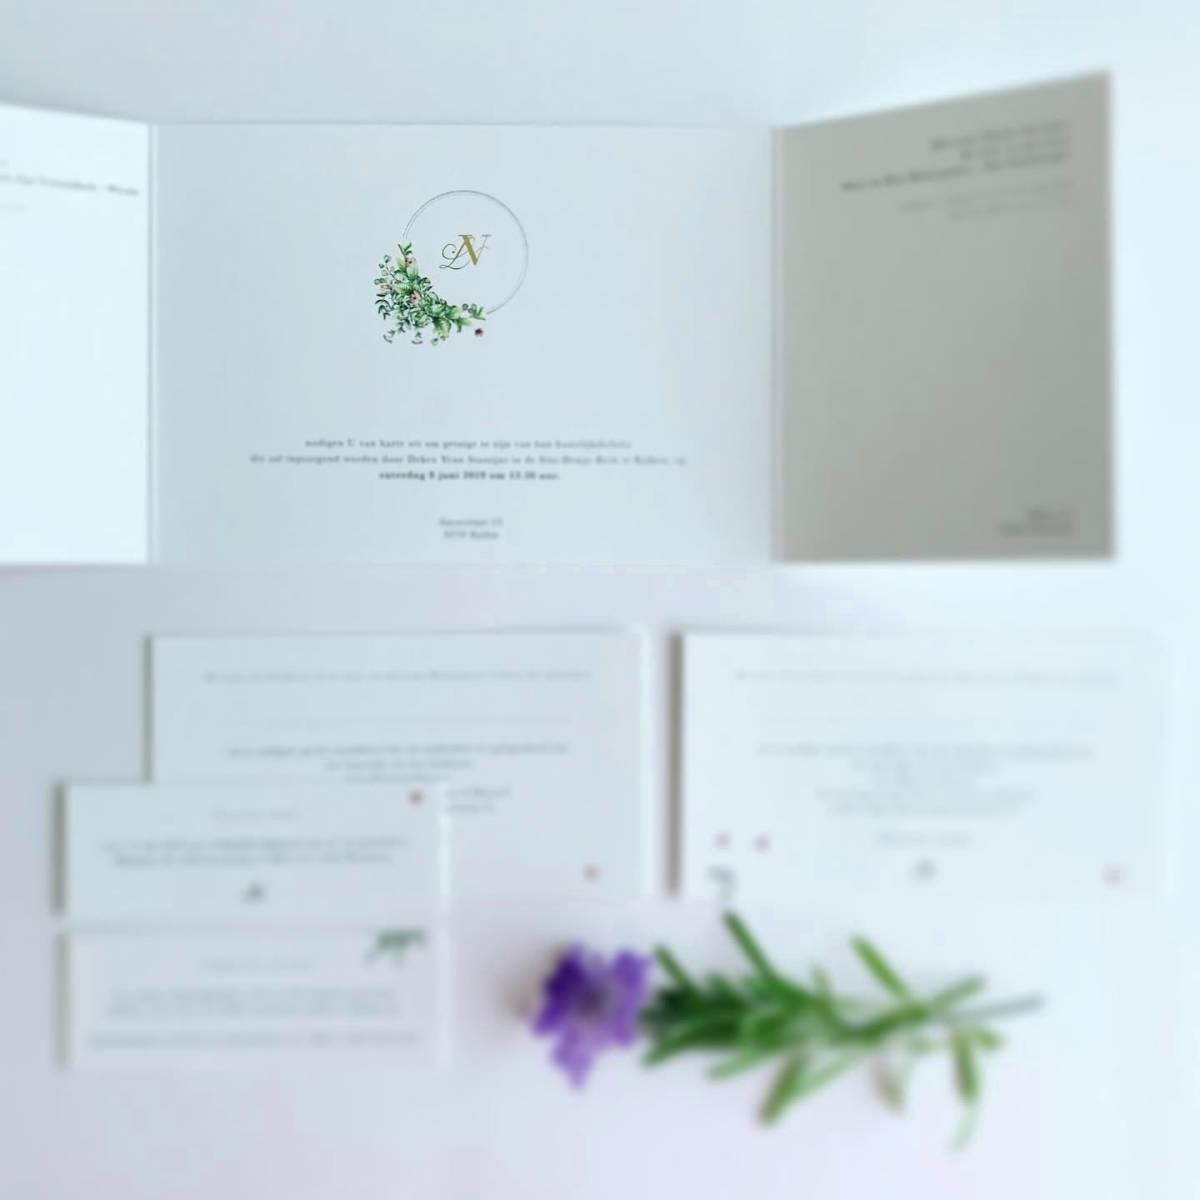 Scarabar - Trouwuitnodiging - Huwelijksuitnodiging - Drukwerk - Huwelijk - Trouw - Bruiloft - House of Weddings - 40